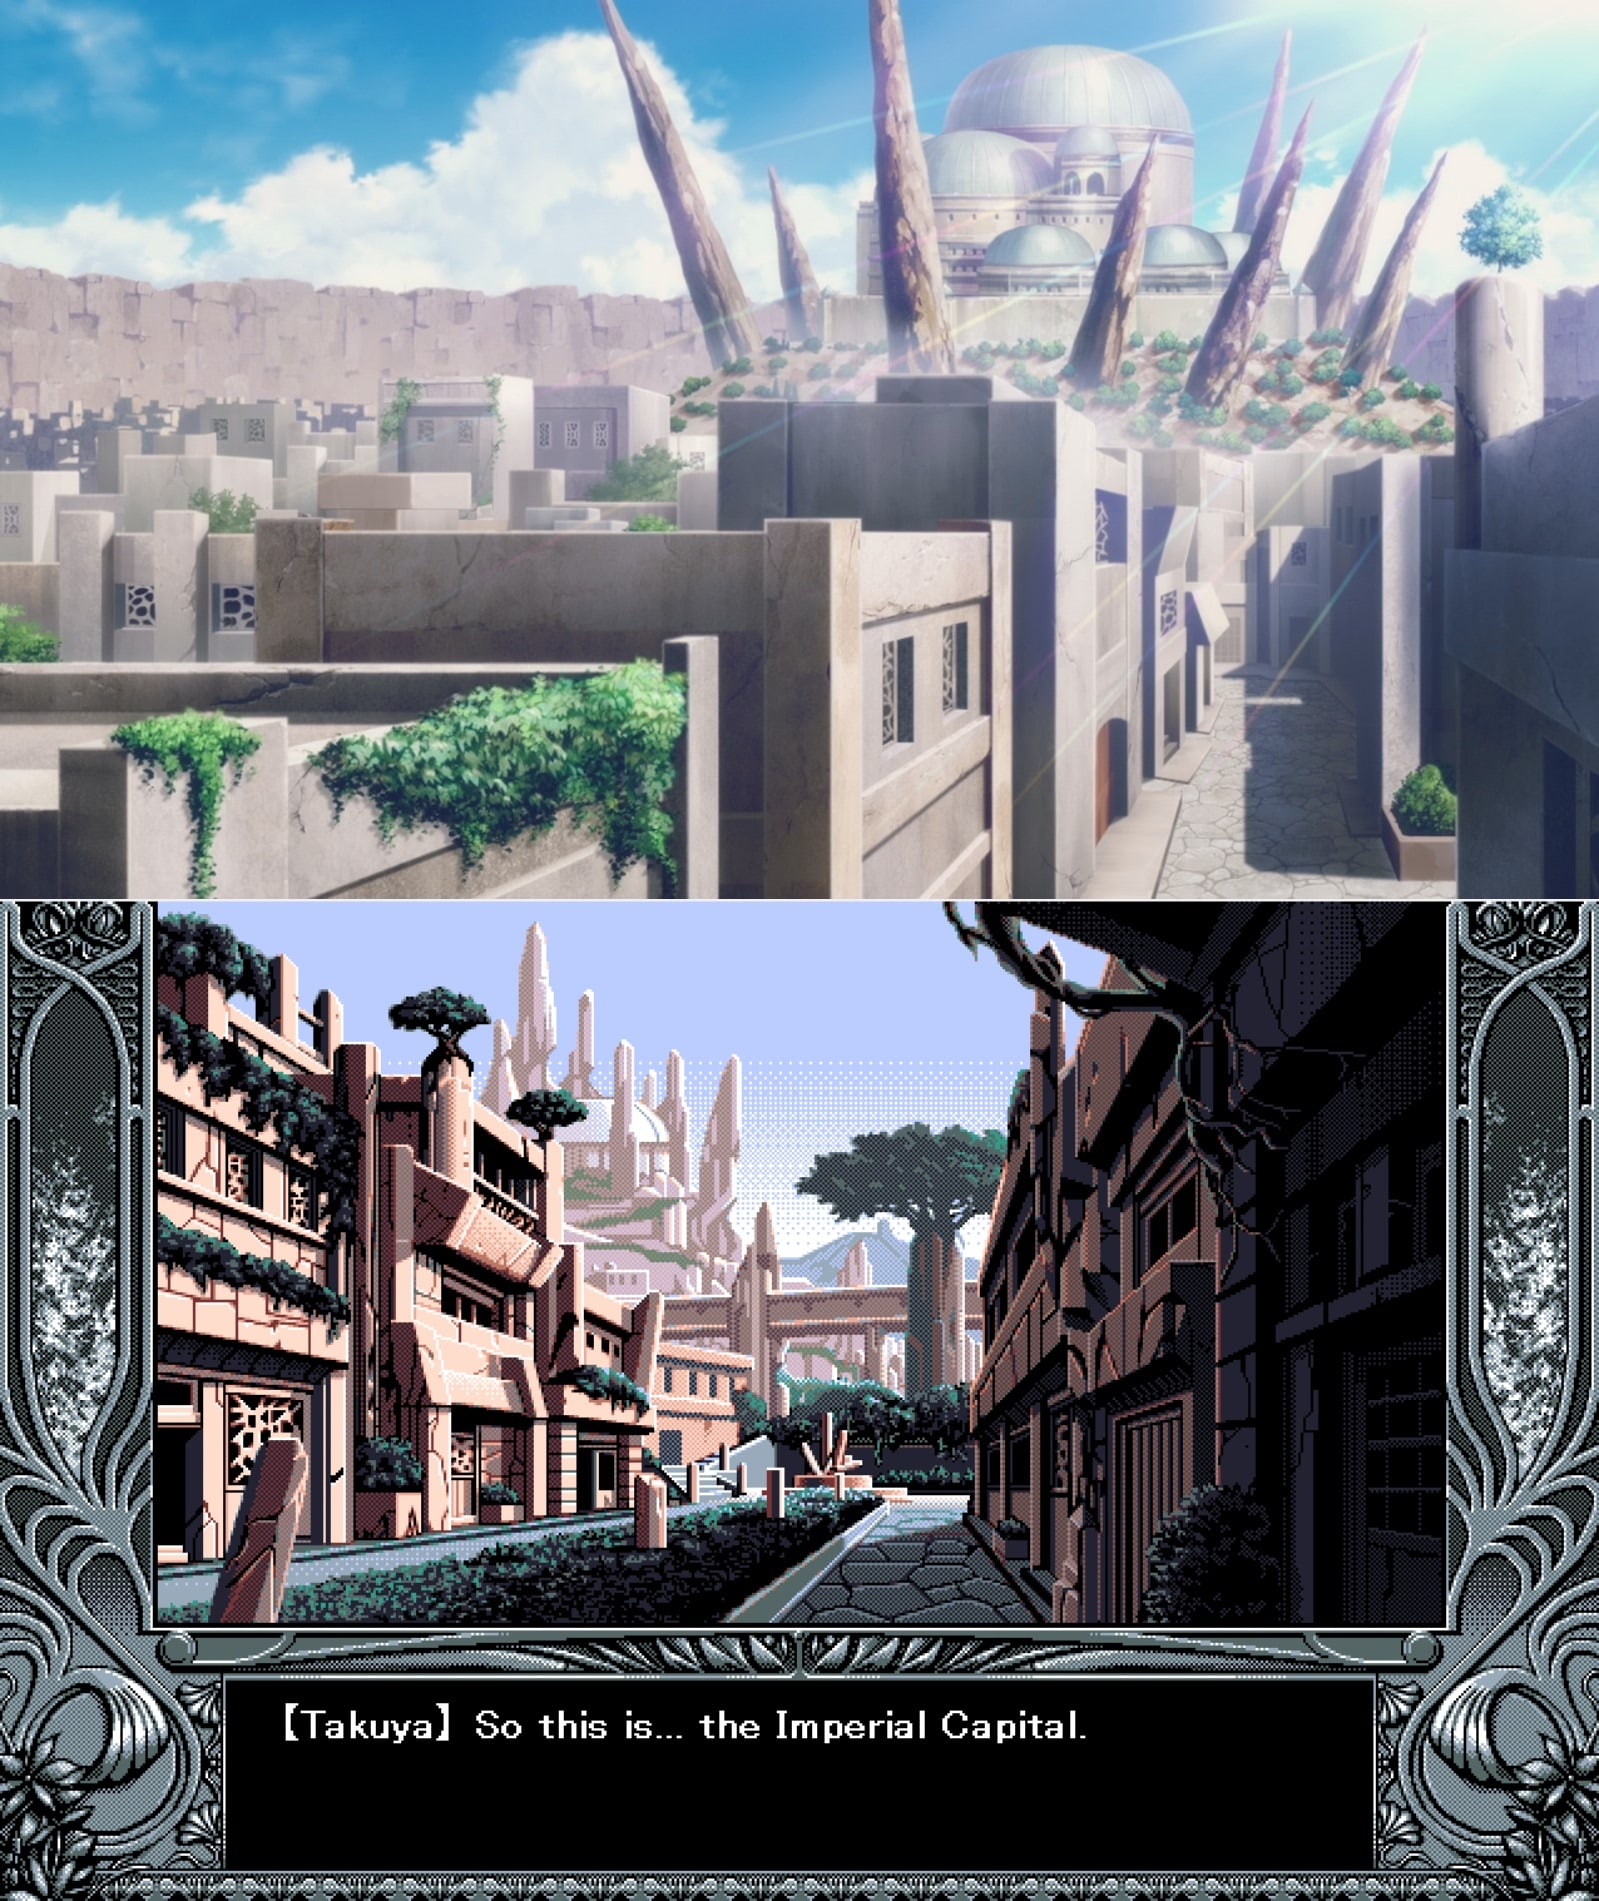 La Capital Imperial isekai YU-NO